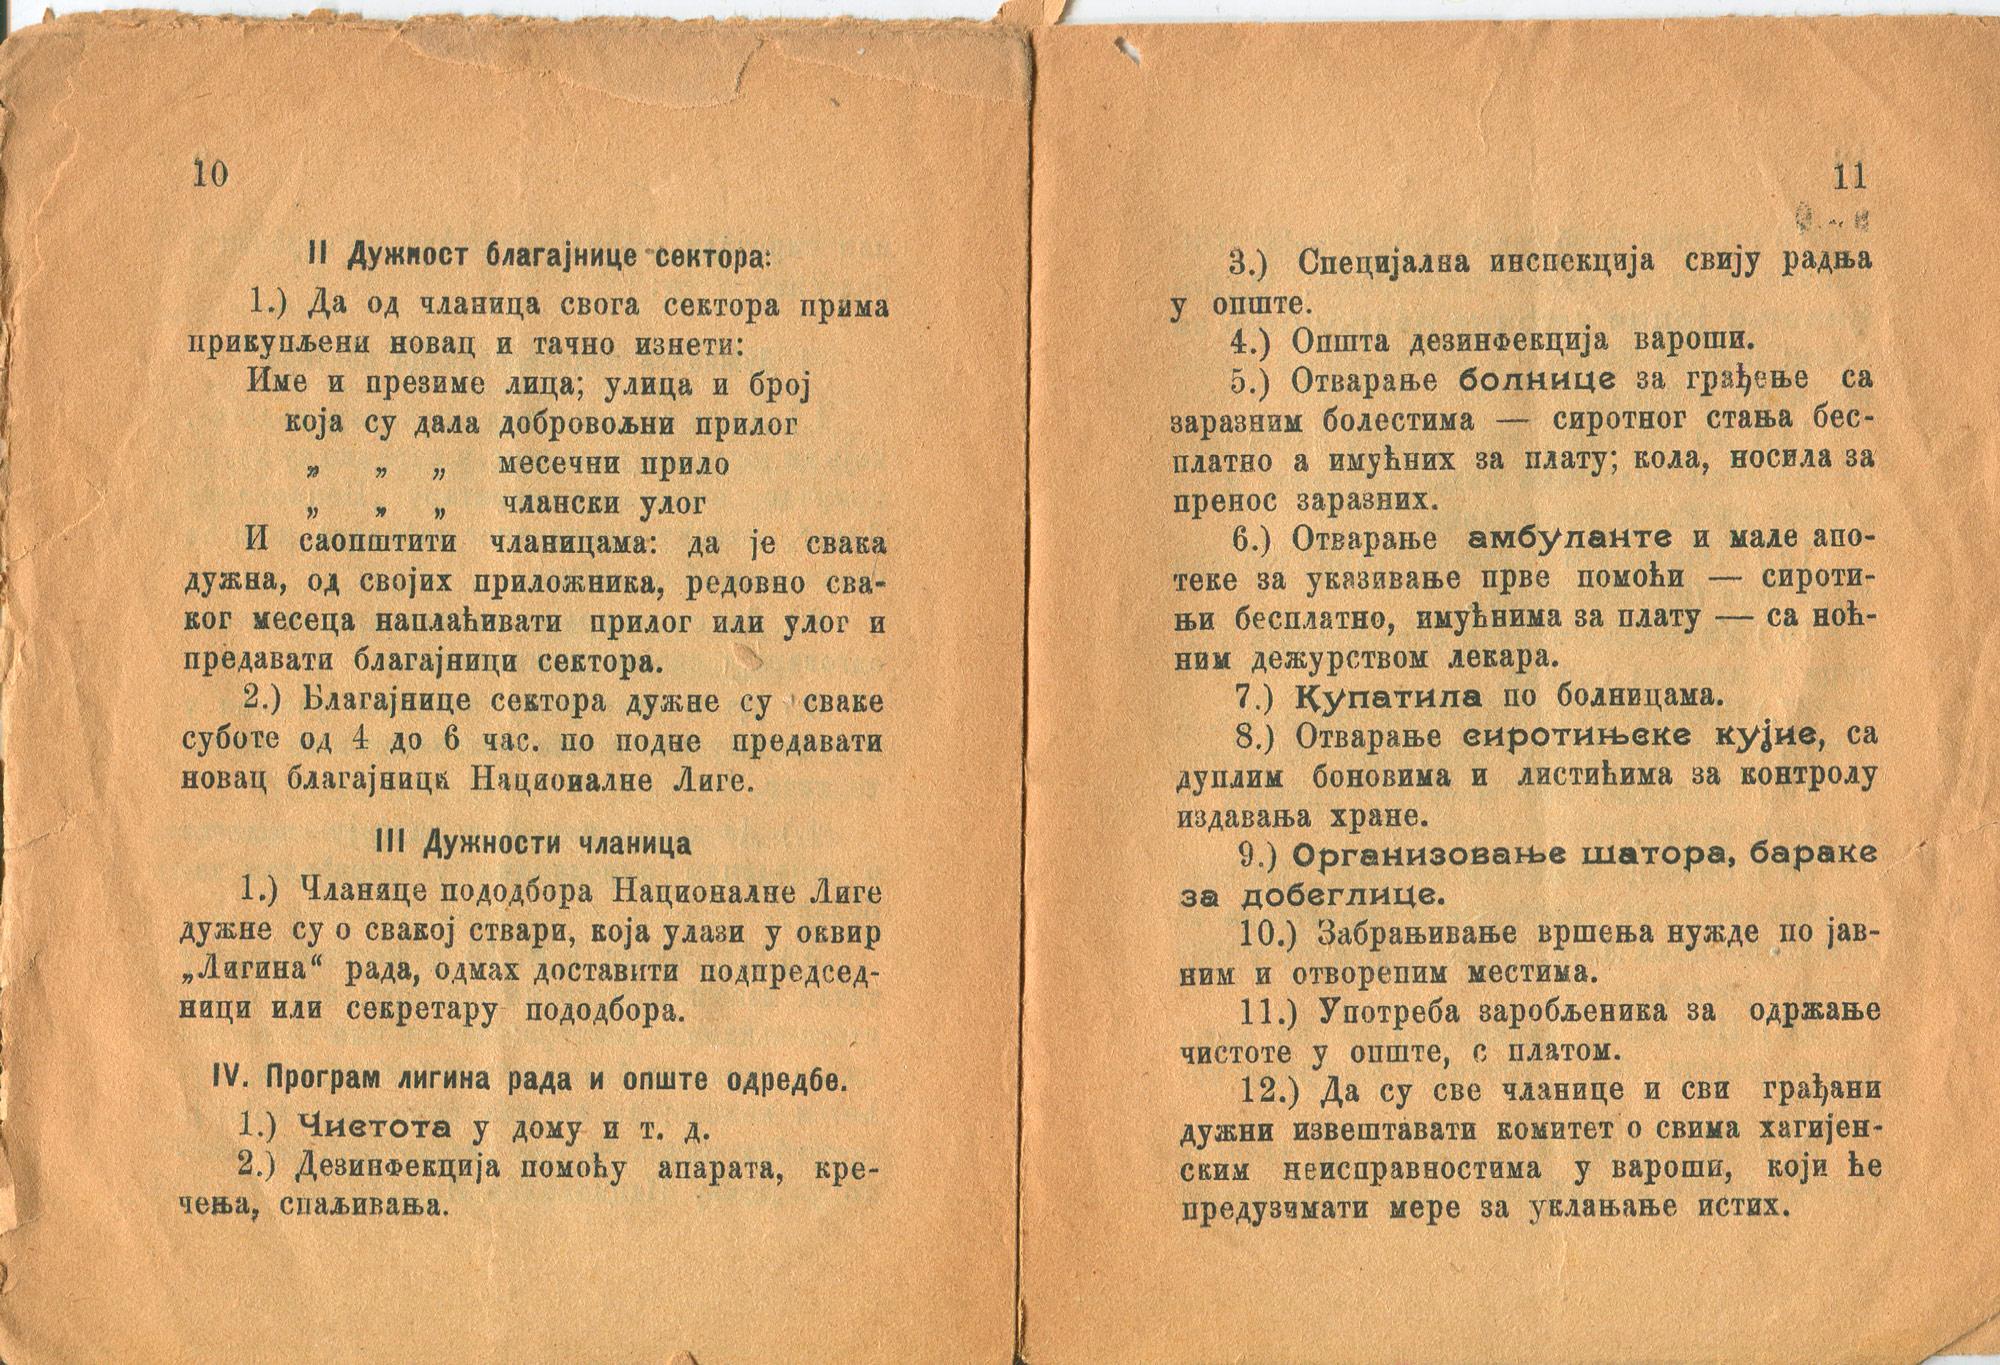 National league of Serbian women publication